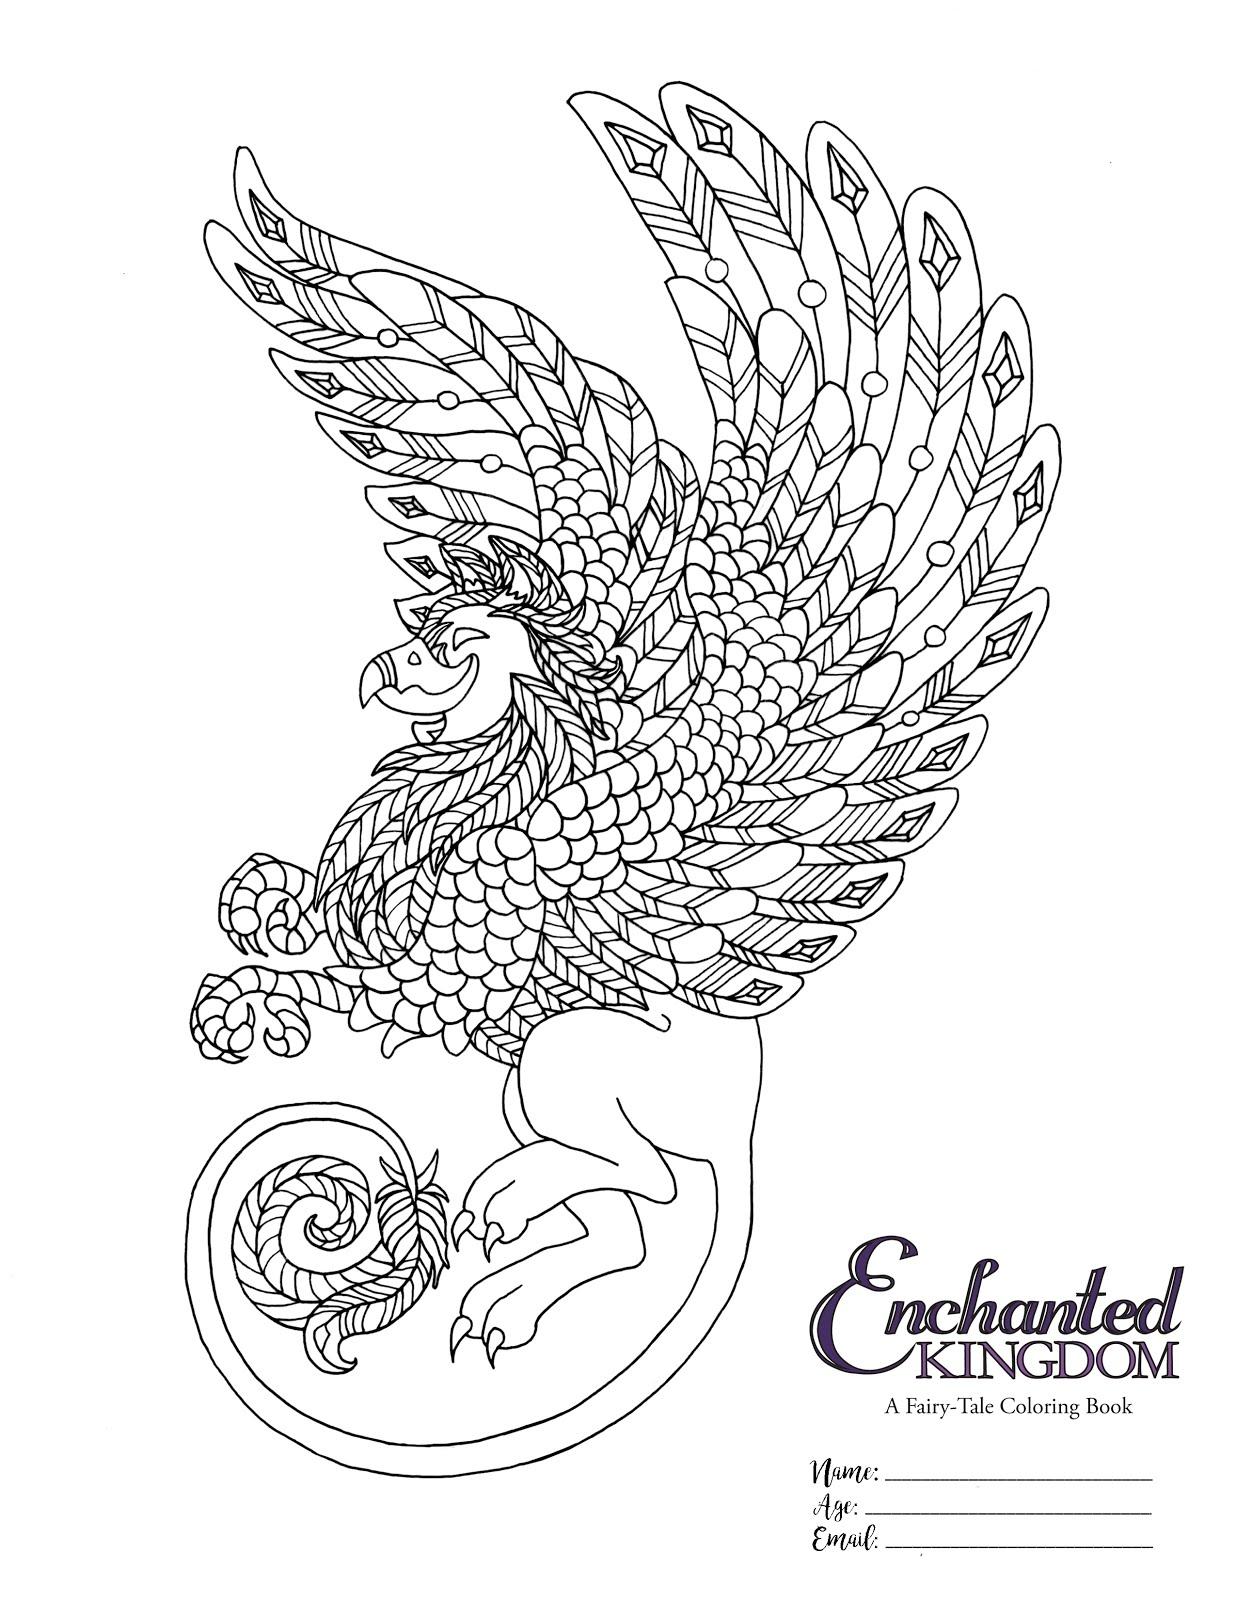 The Flight Reflex: Enchanted Kingdom - Coloring Contest!!